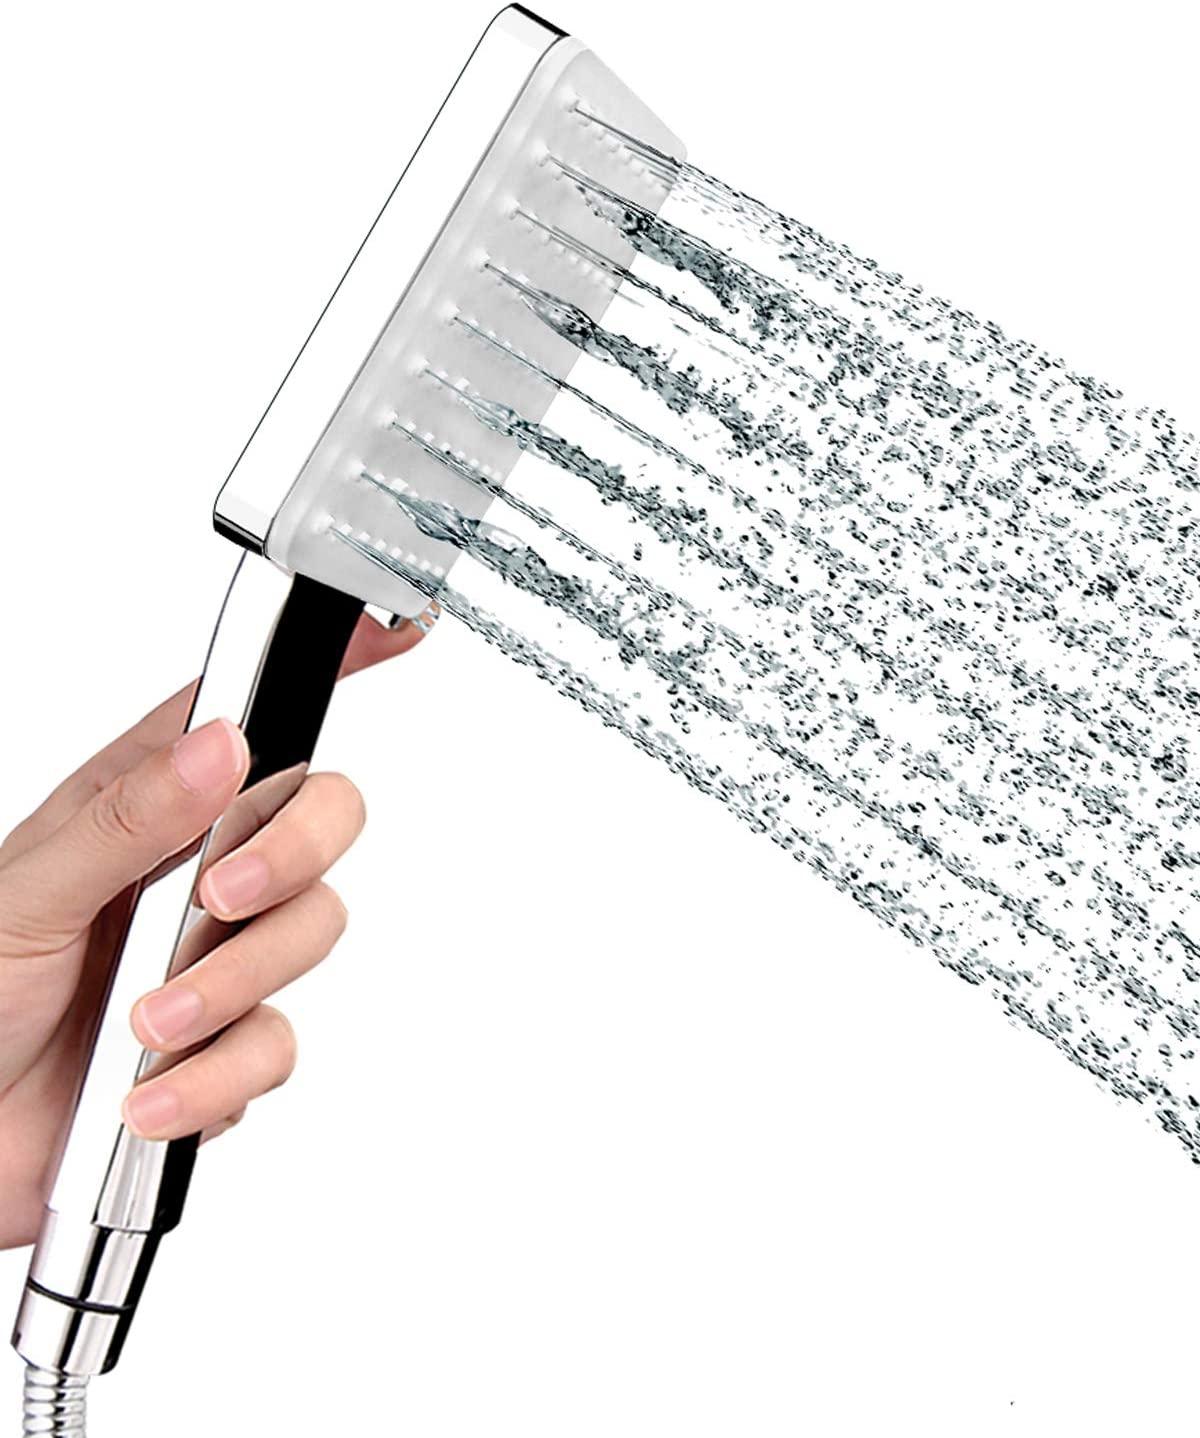 Newentor Shower Head Hand-held, High Pressure Shower Head with 59